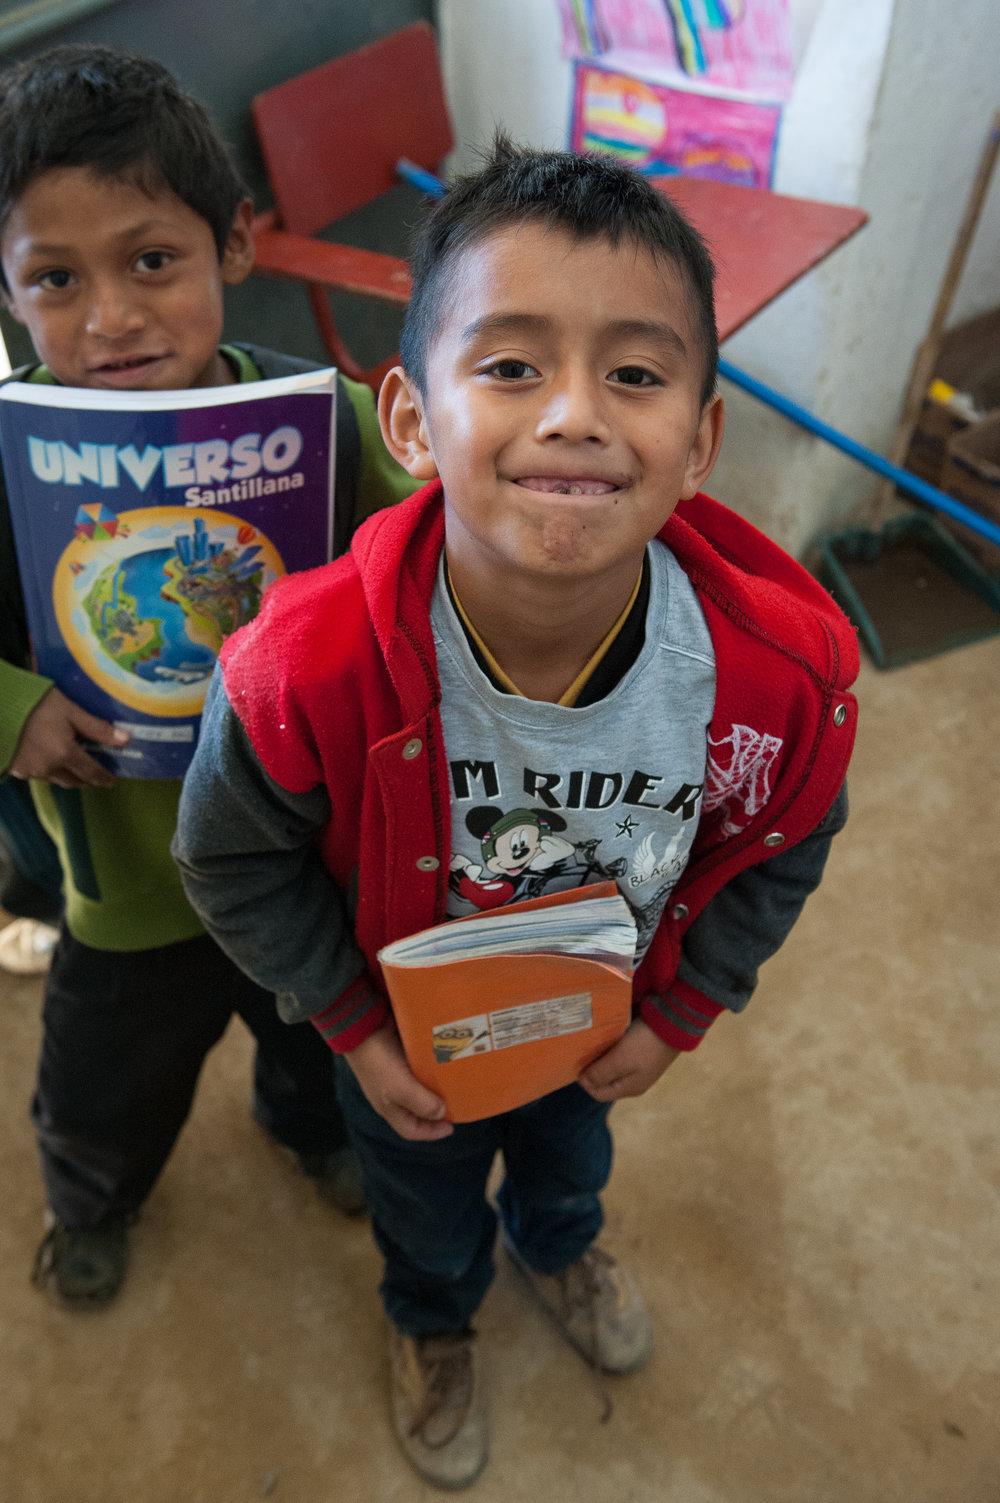 1540 LONG WAY HOME_2016_Guatemala_photographers without borders_ronbwilson_160302_286.jpg